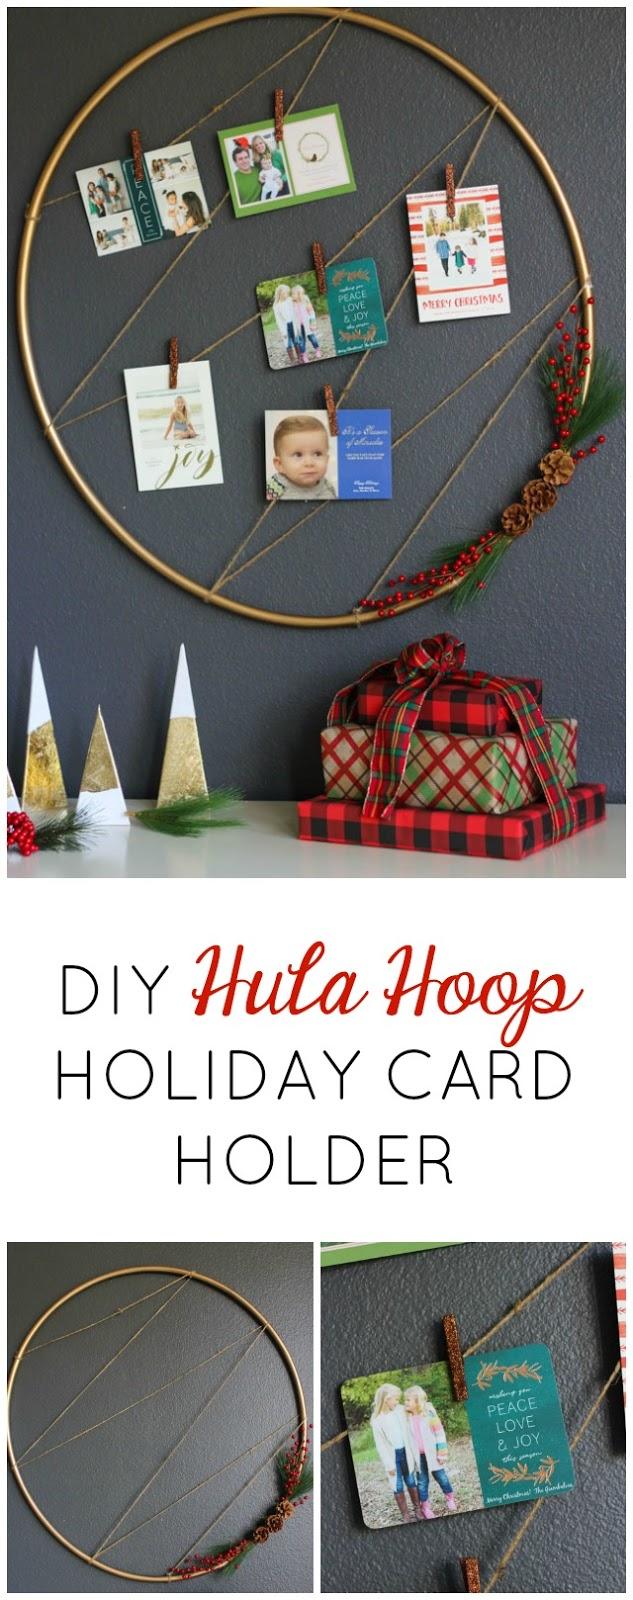 Love this simple Christmas card display idea!